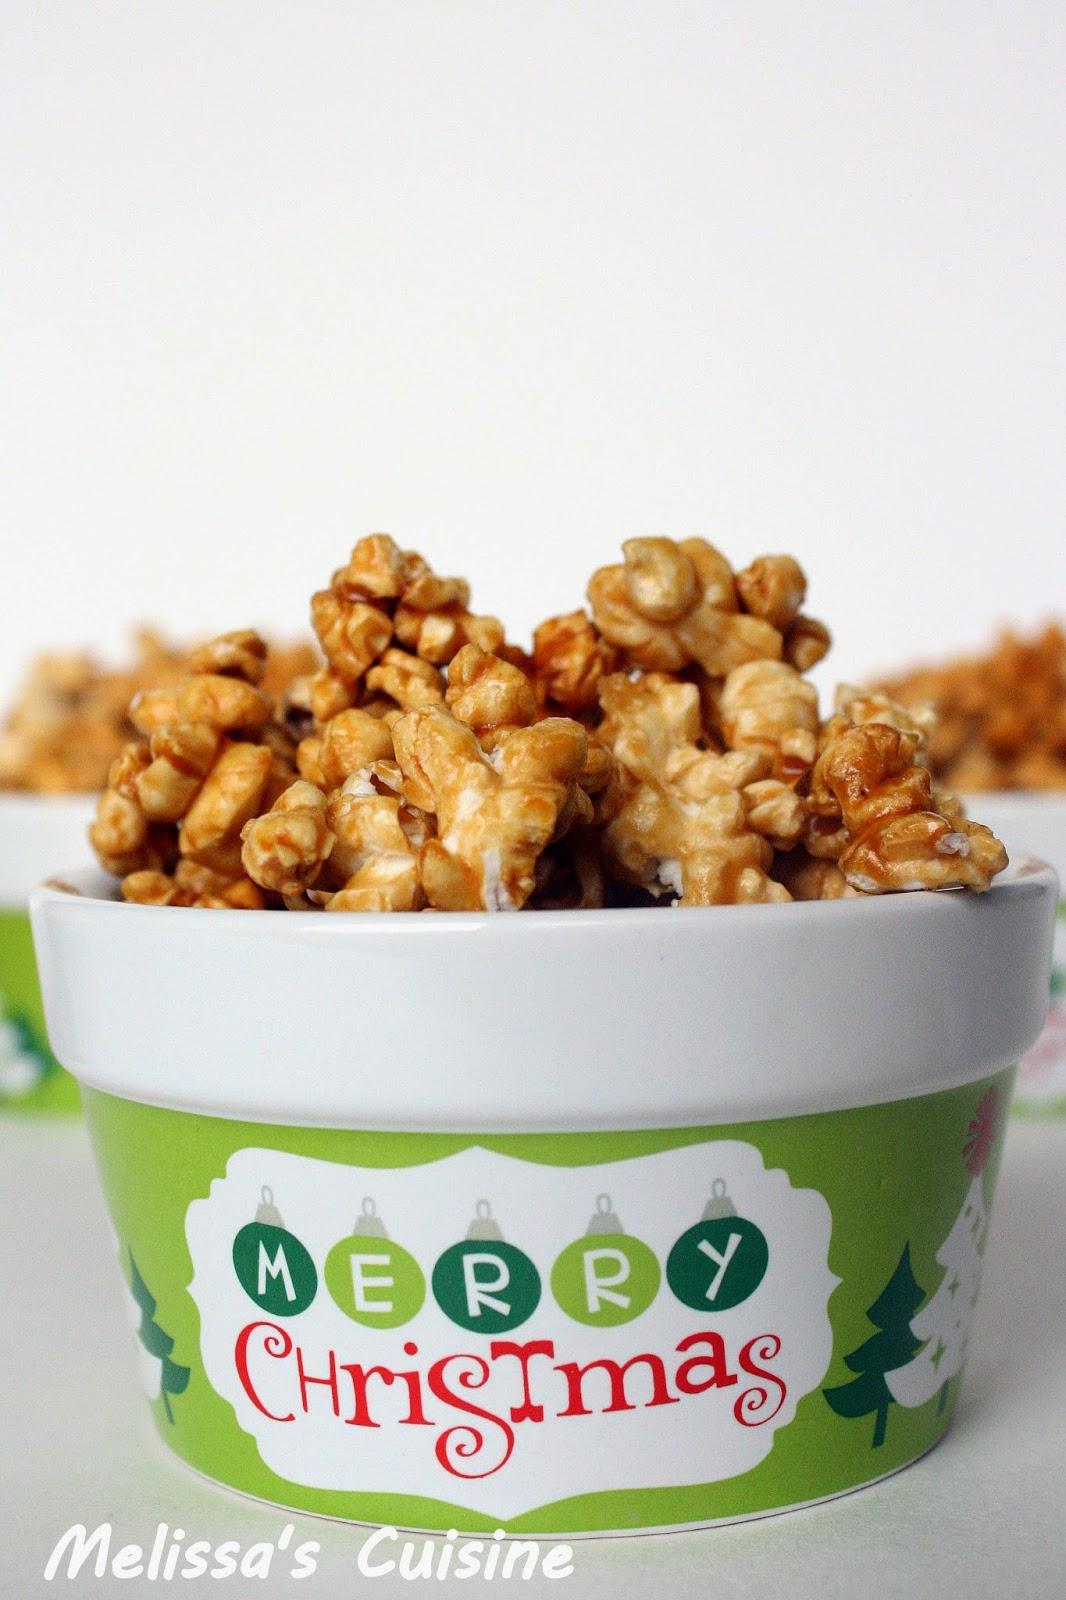 Melissa's Cuisine: Caramel Corn